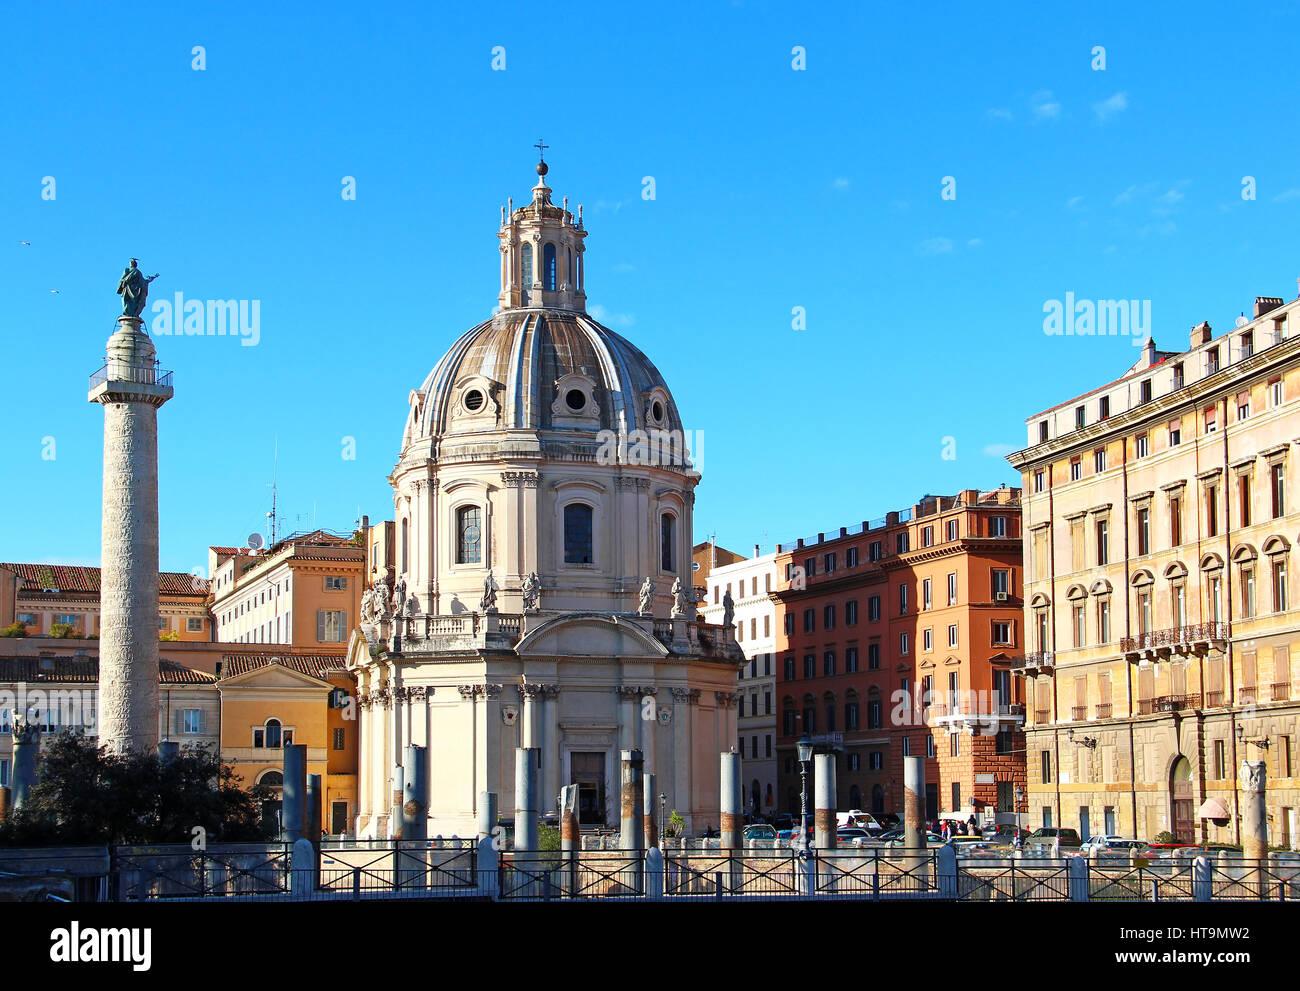 Santa Maria di Loreto church and Trajan column, Rome, Italy - Stock Image